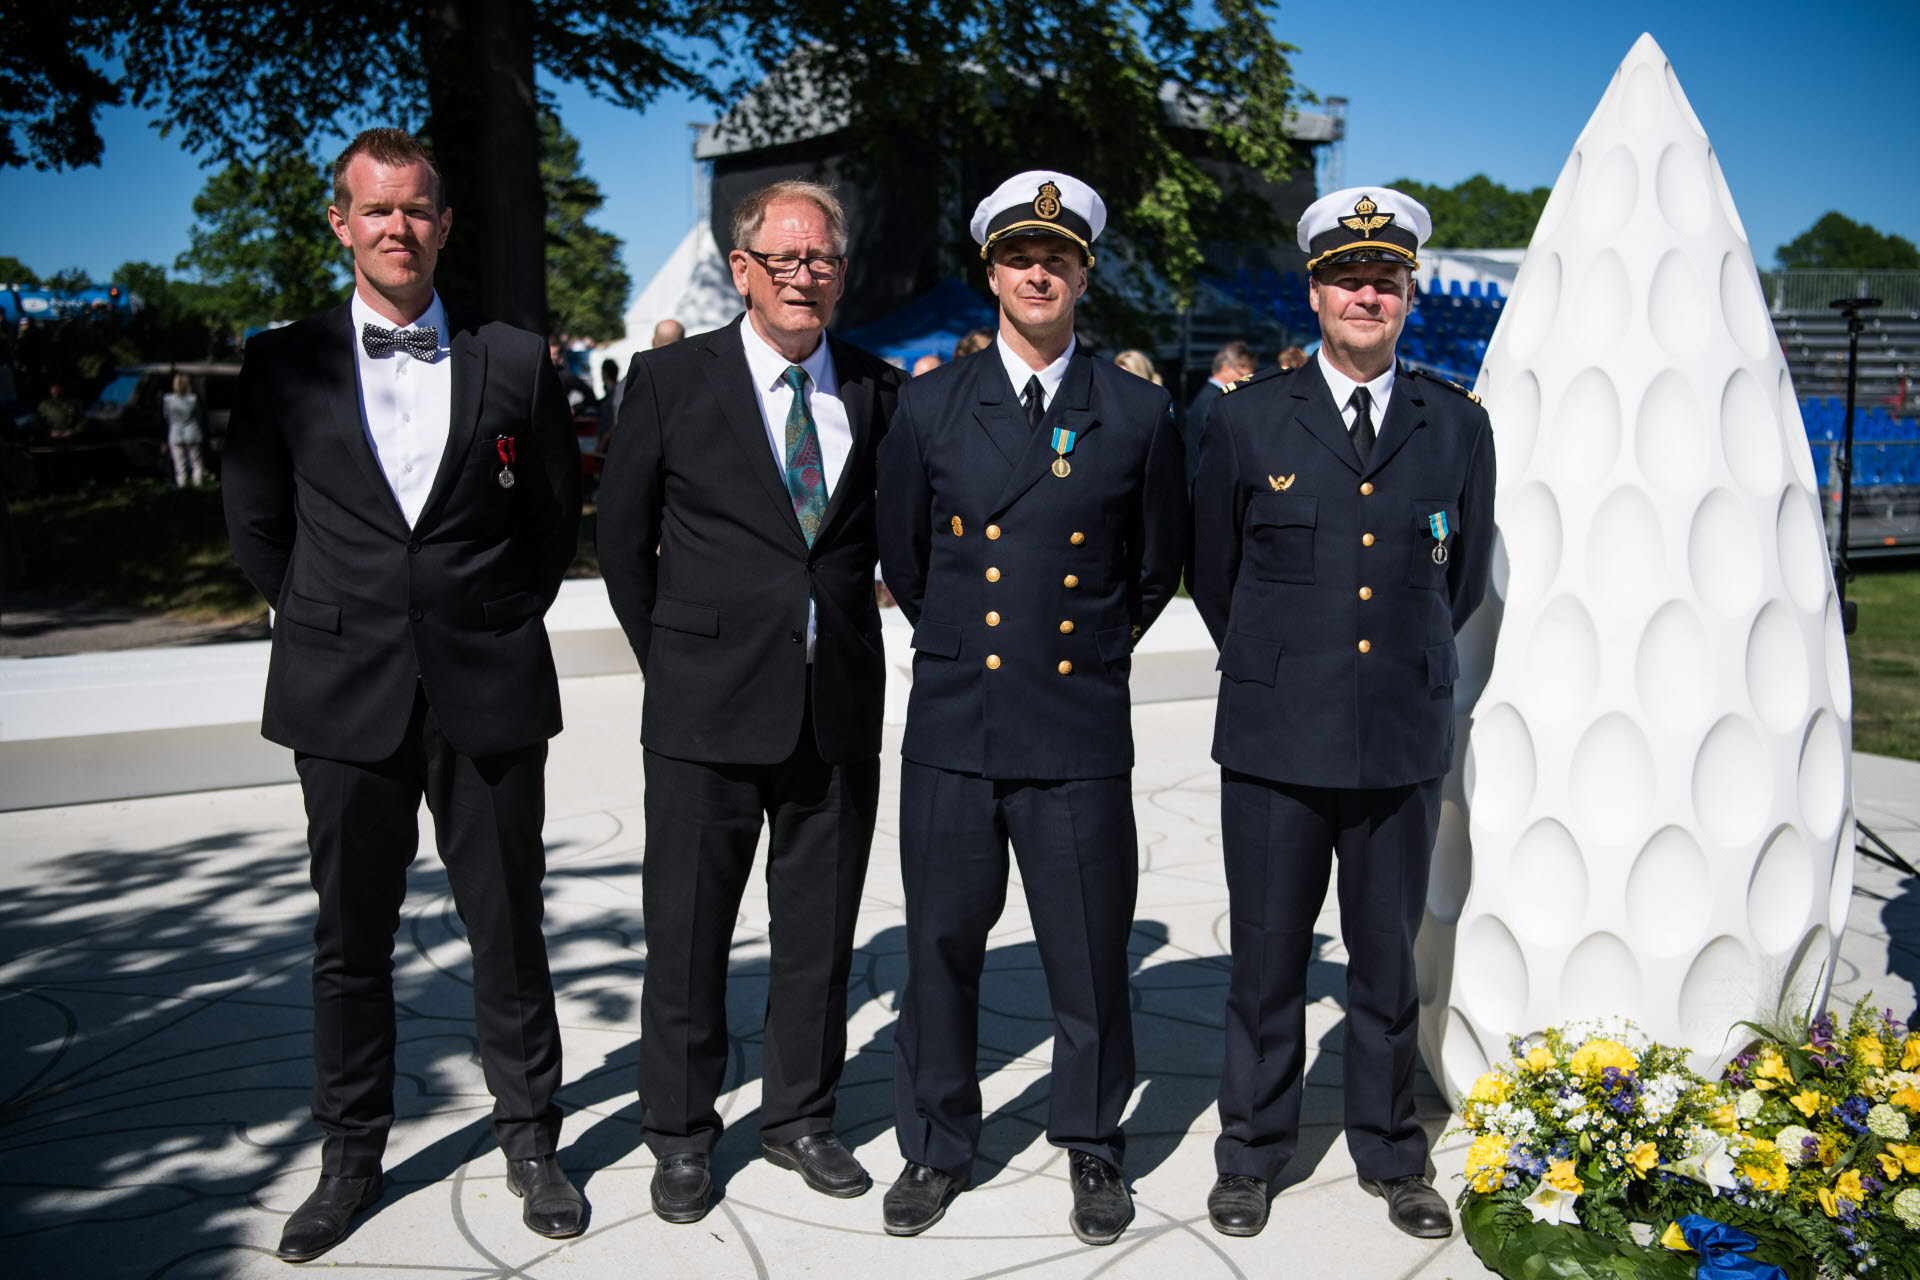 Forsvaret hedrade de omkomnas minne